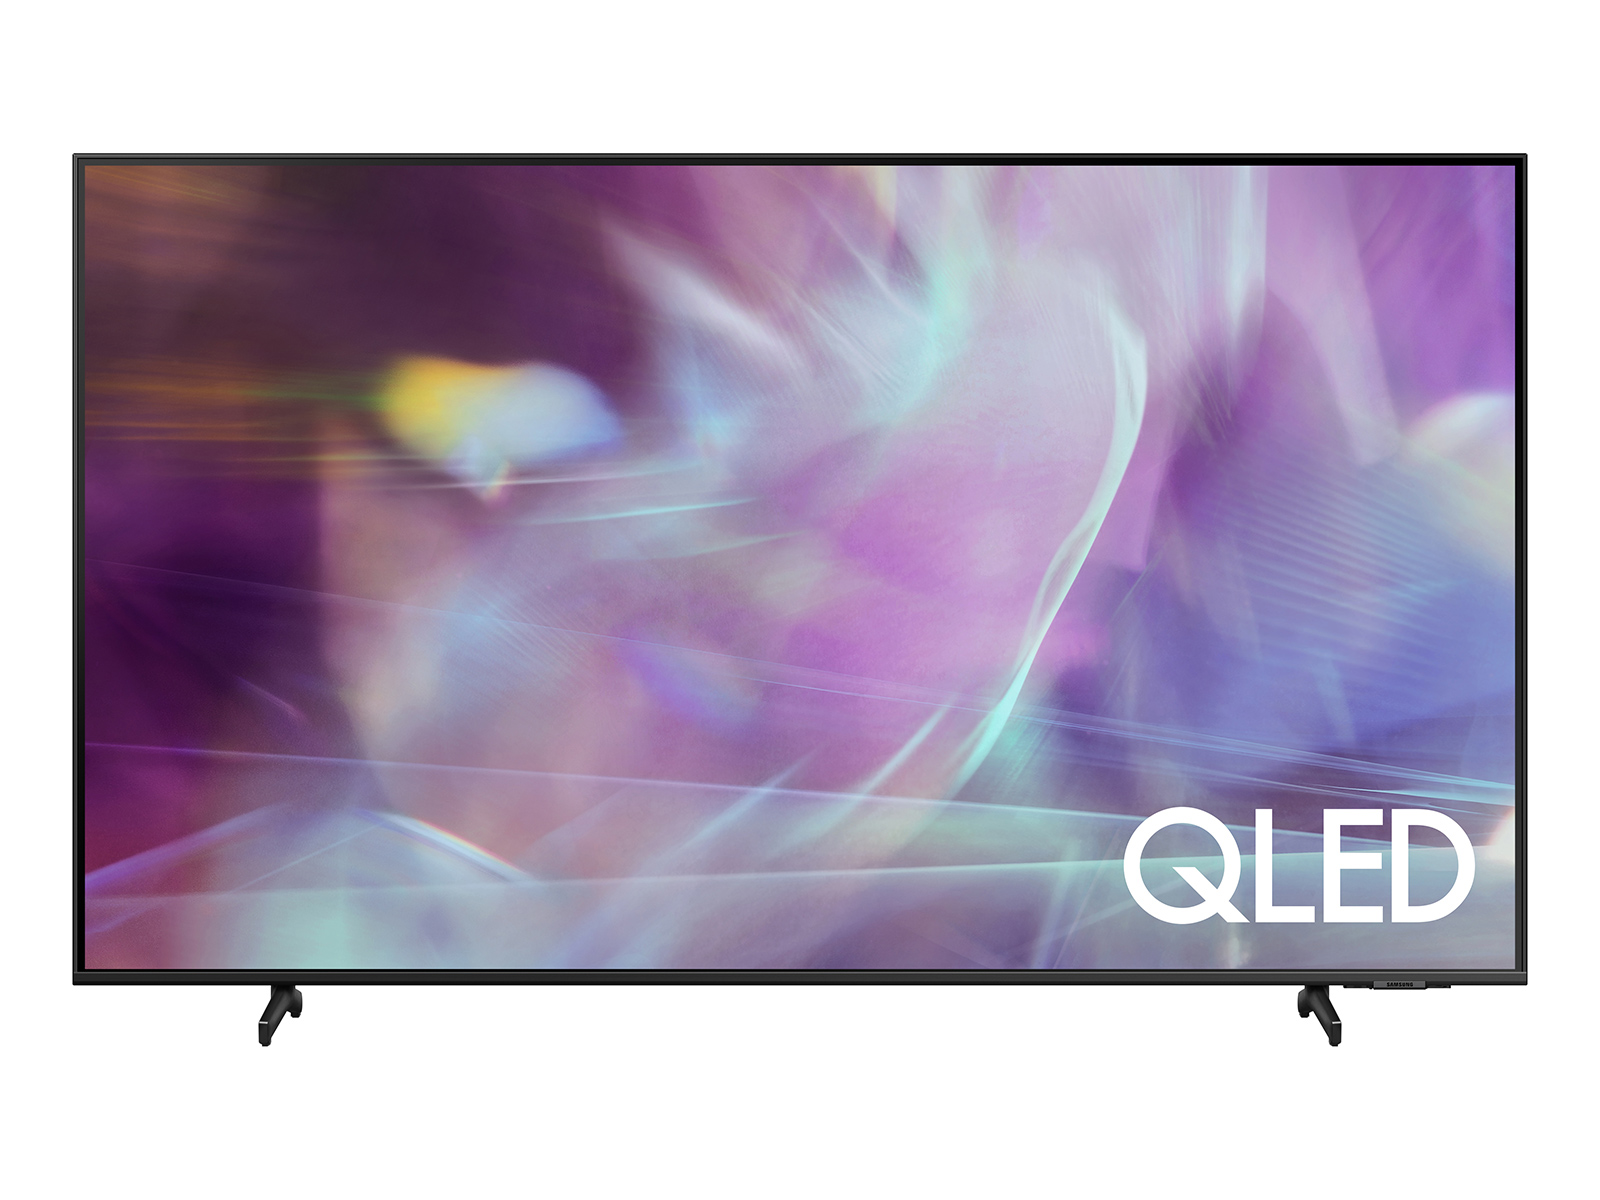 Samsung 85 Q60A QLED 4K Smart TV, QN85Q60AAFXZA, 2021